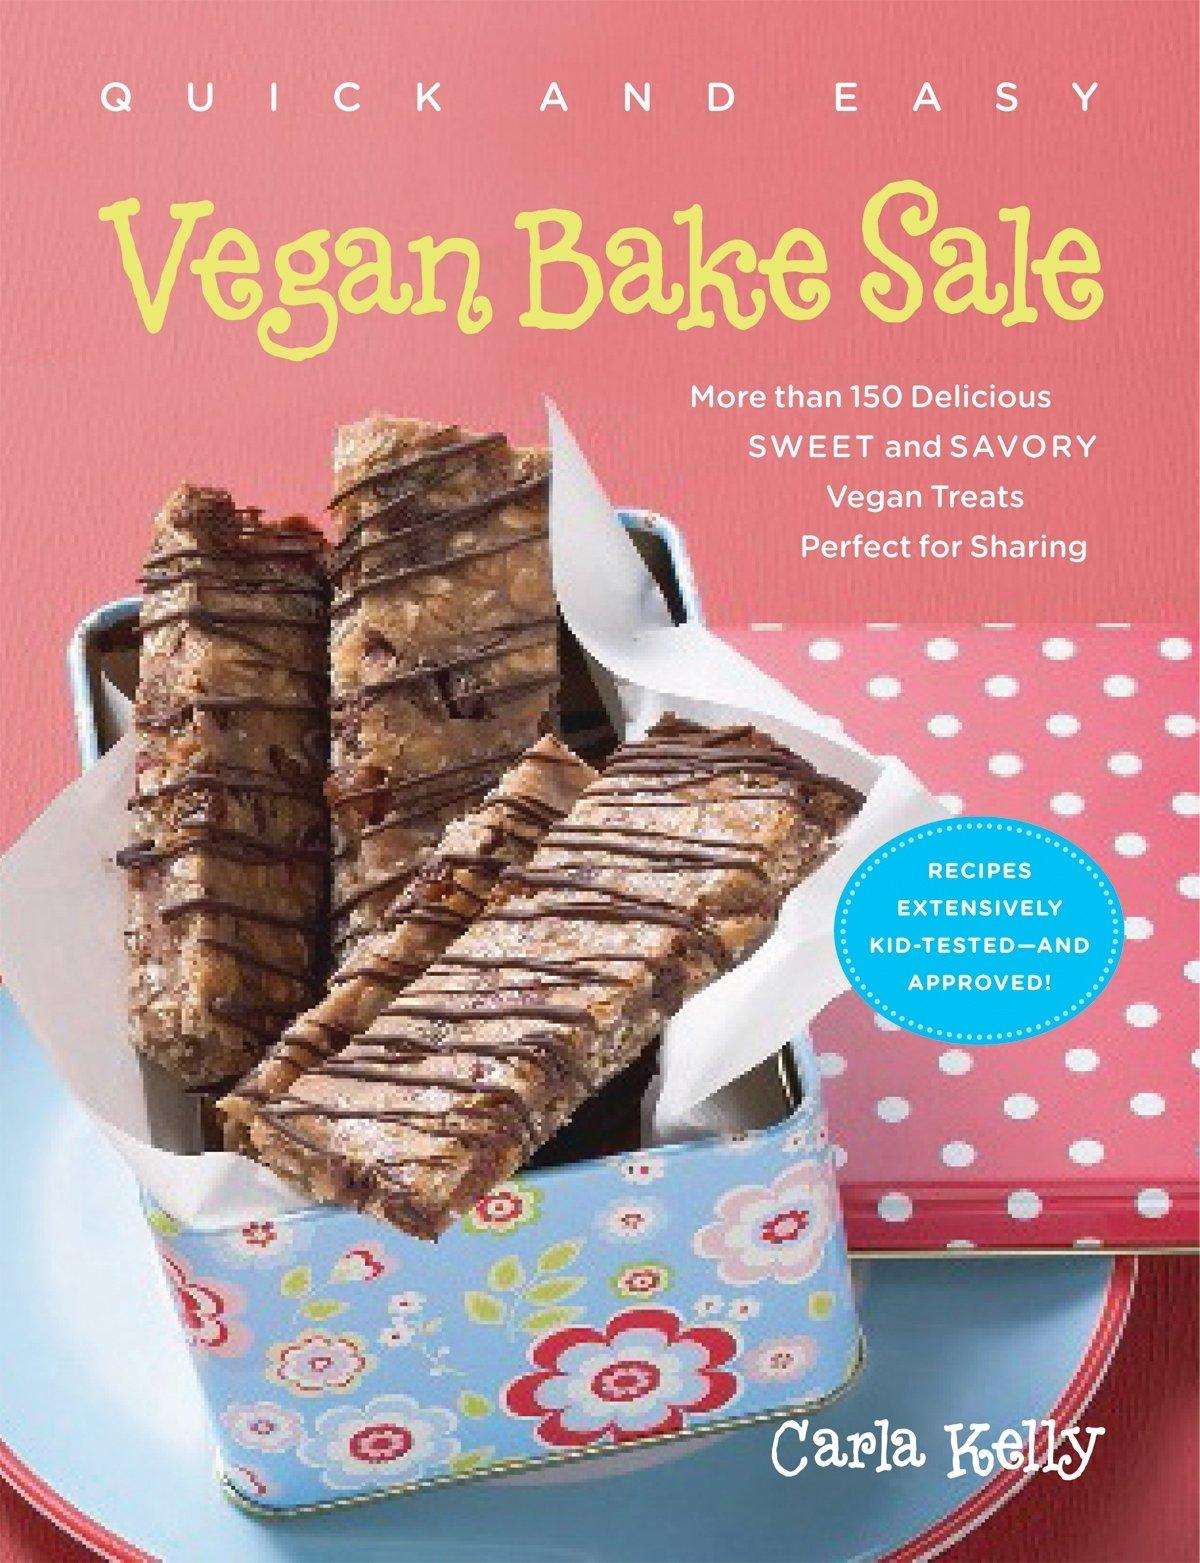 10 Wonderful Bake Sale Ideas For Kids quick easy vegan bake sale the experiment 2020